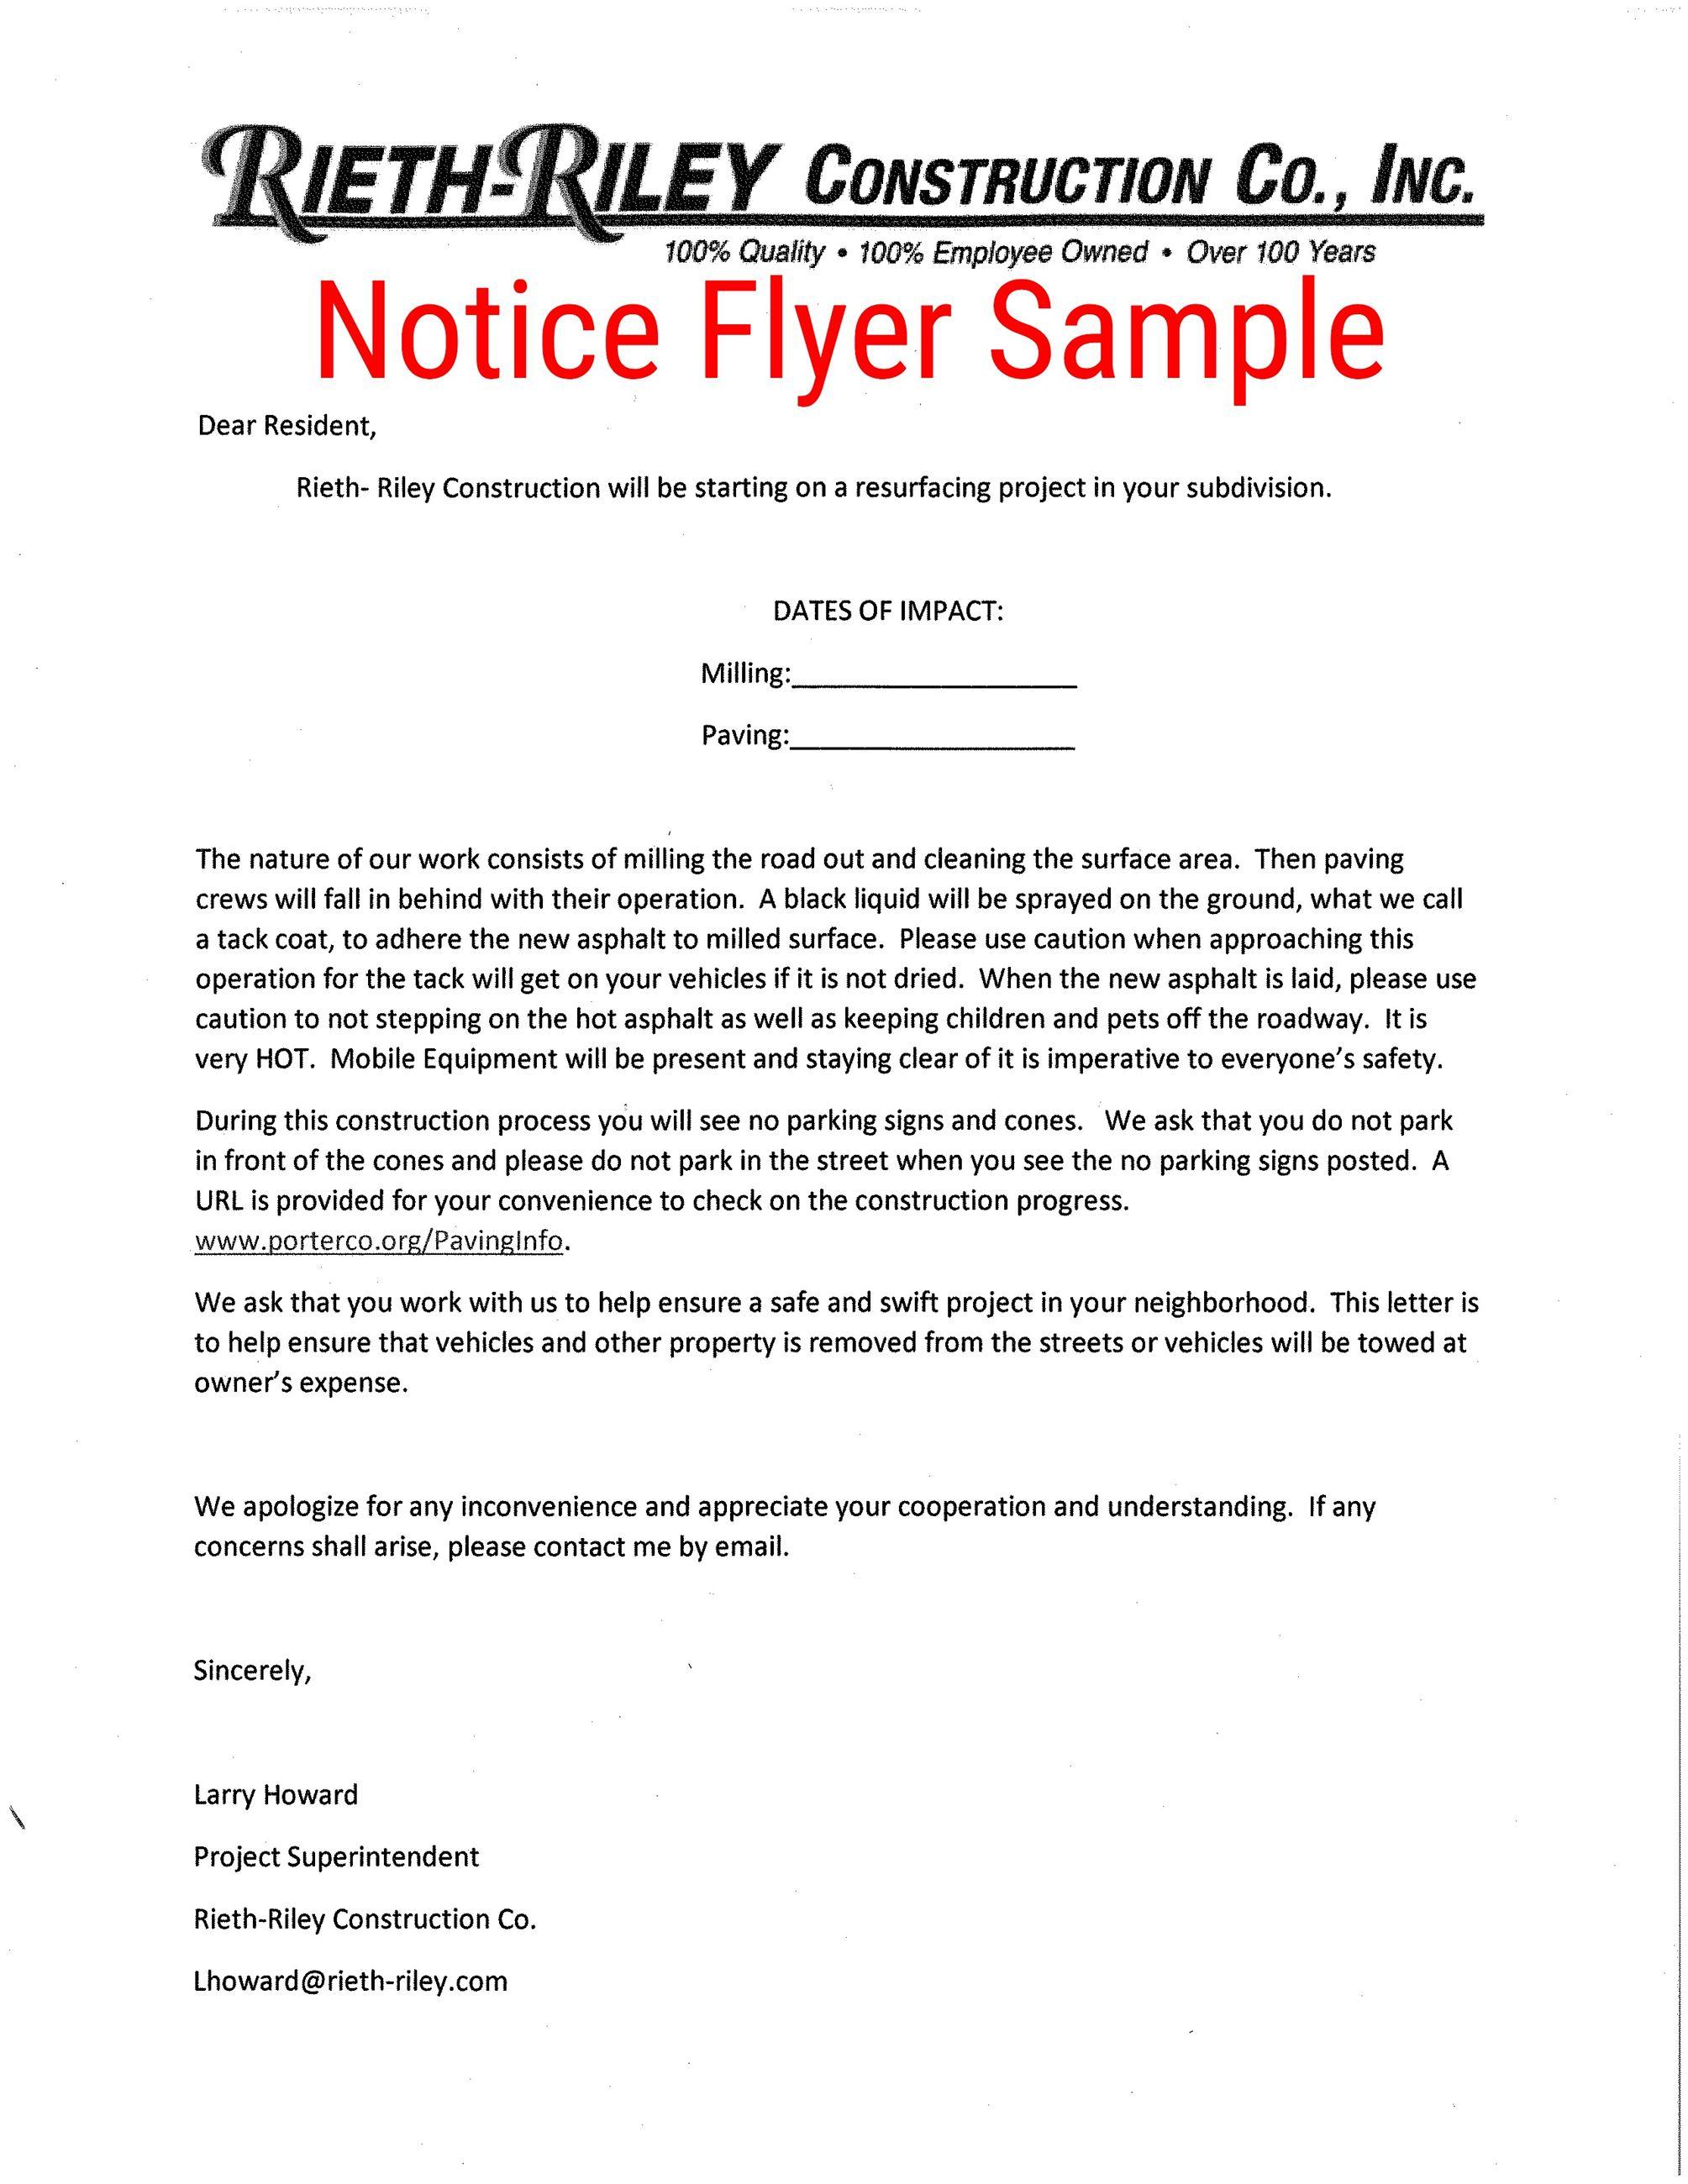 Notice Flyer Sample PNG